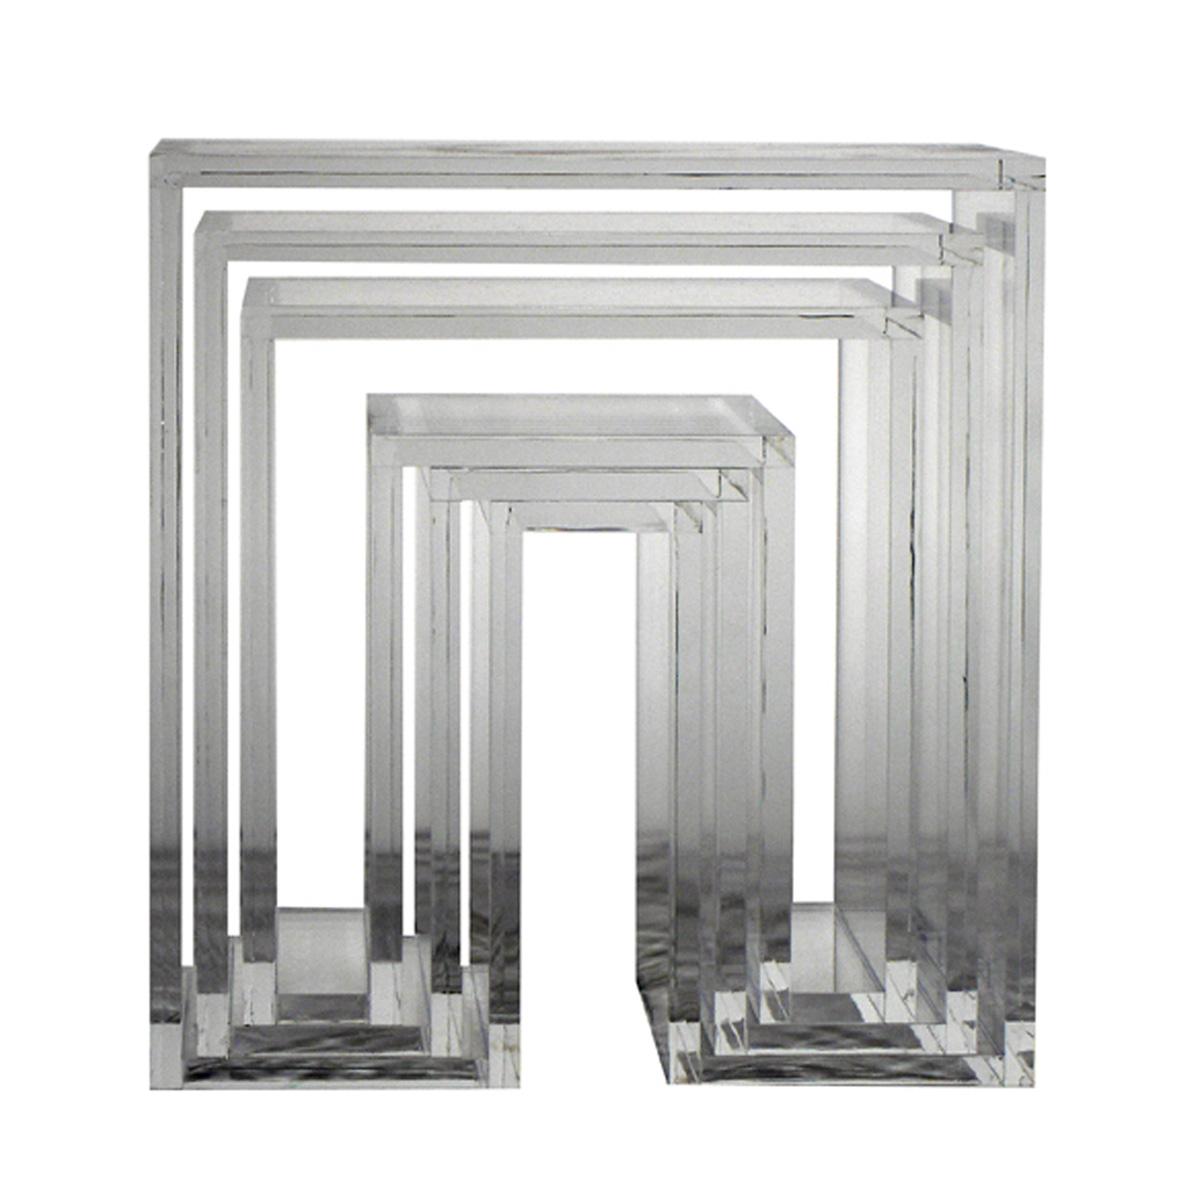 abode 3個セットネスティングテーブル クリア Nesting Tables 3pc.SET / ウー・バホリヨディン Ou Baholyodhin バホリヨデン SHOJIシリーズ 収納棚・テーブル・什器・スツール・マガジンラック・コンソール